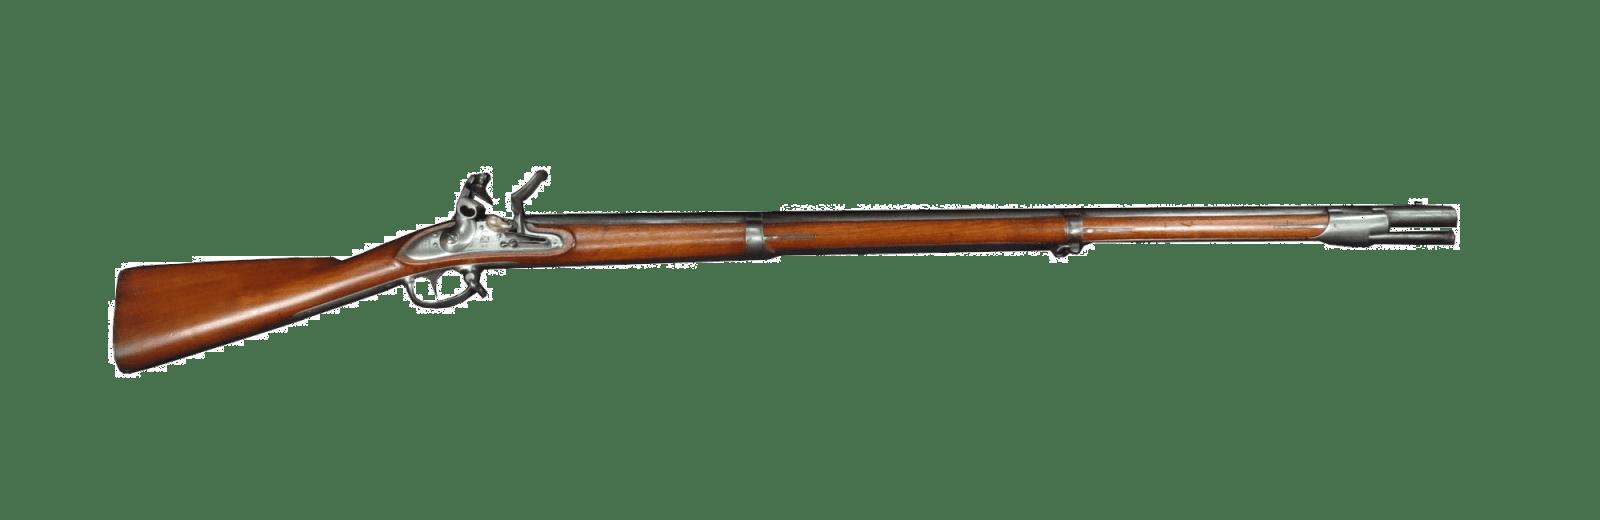 Springfield_Model_1822_Flintlock_Musket_transparent.png